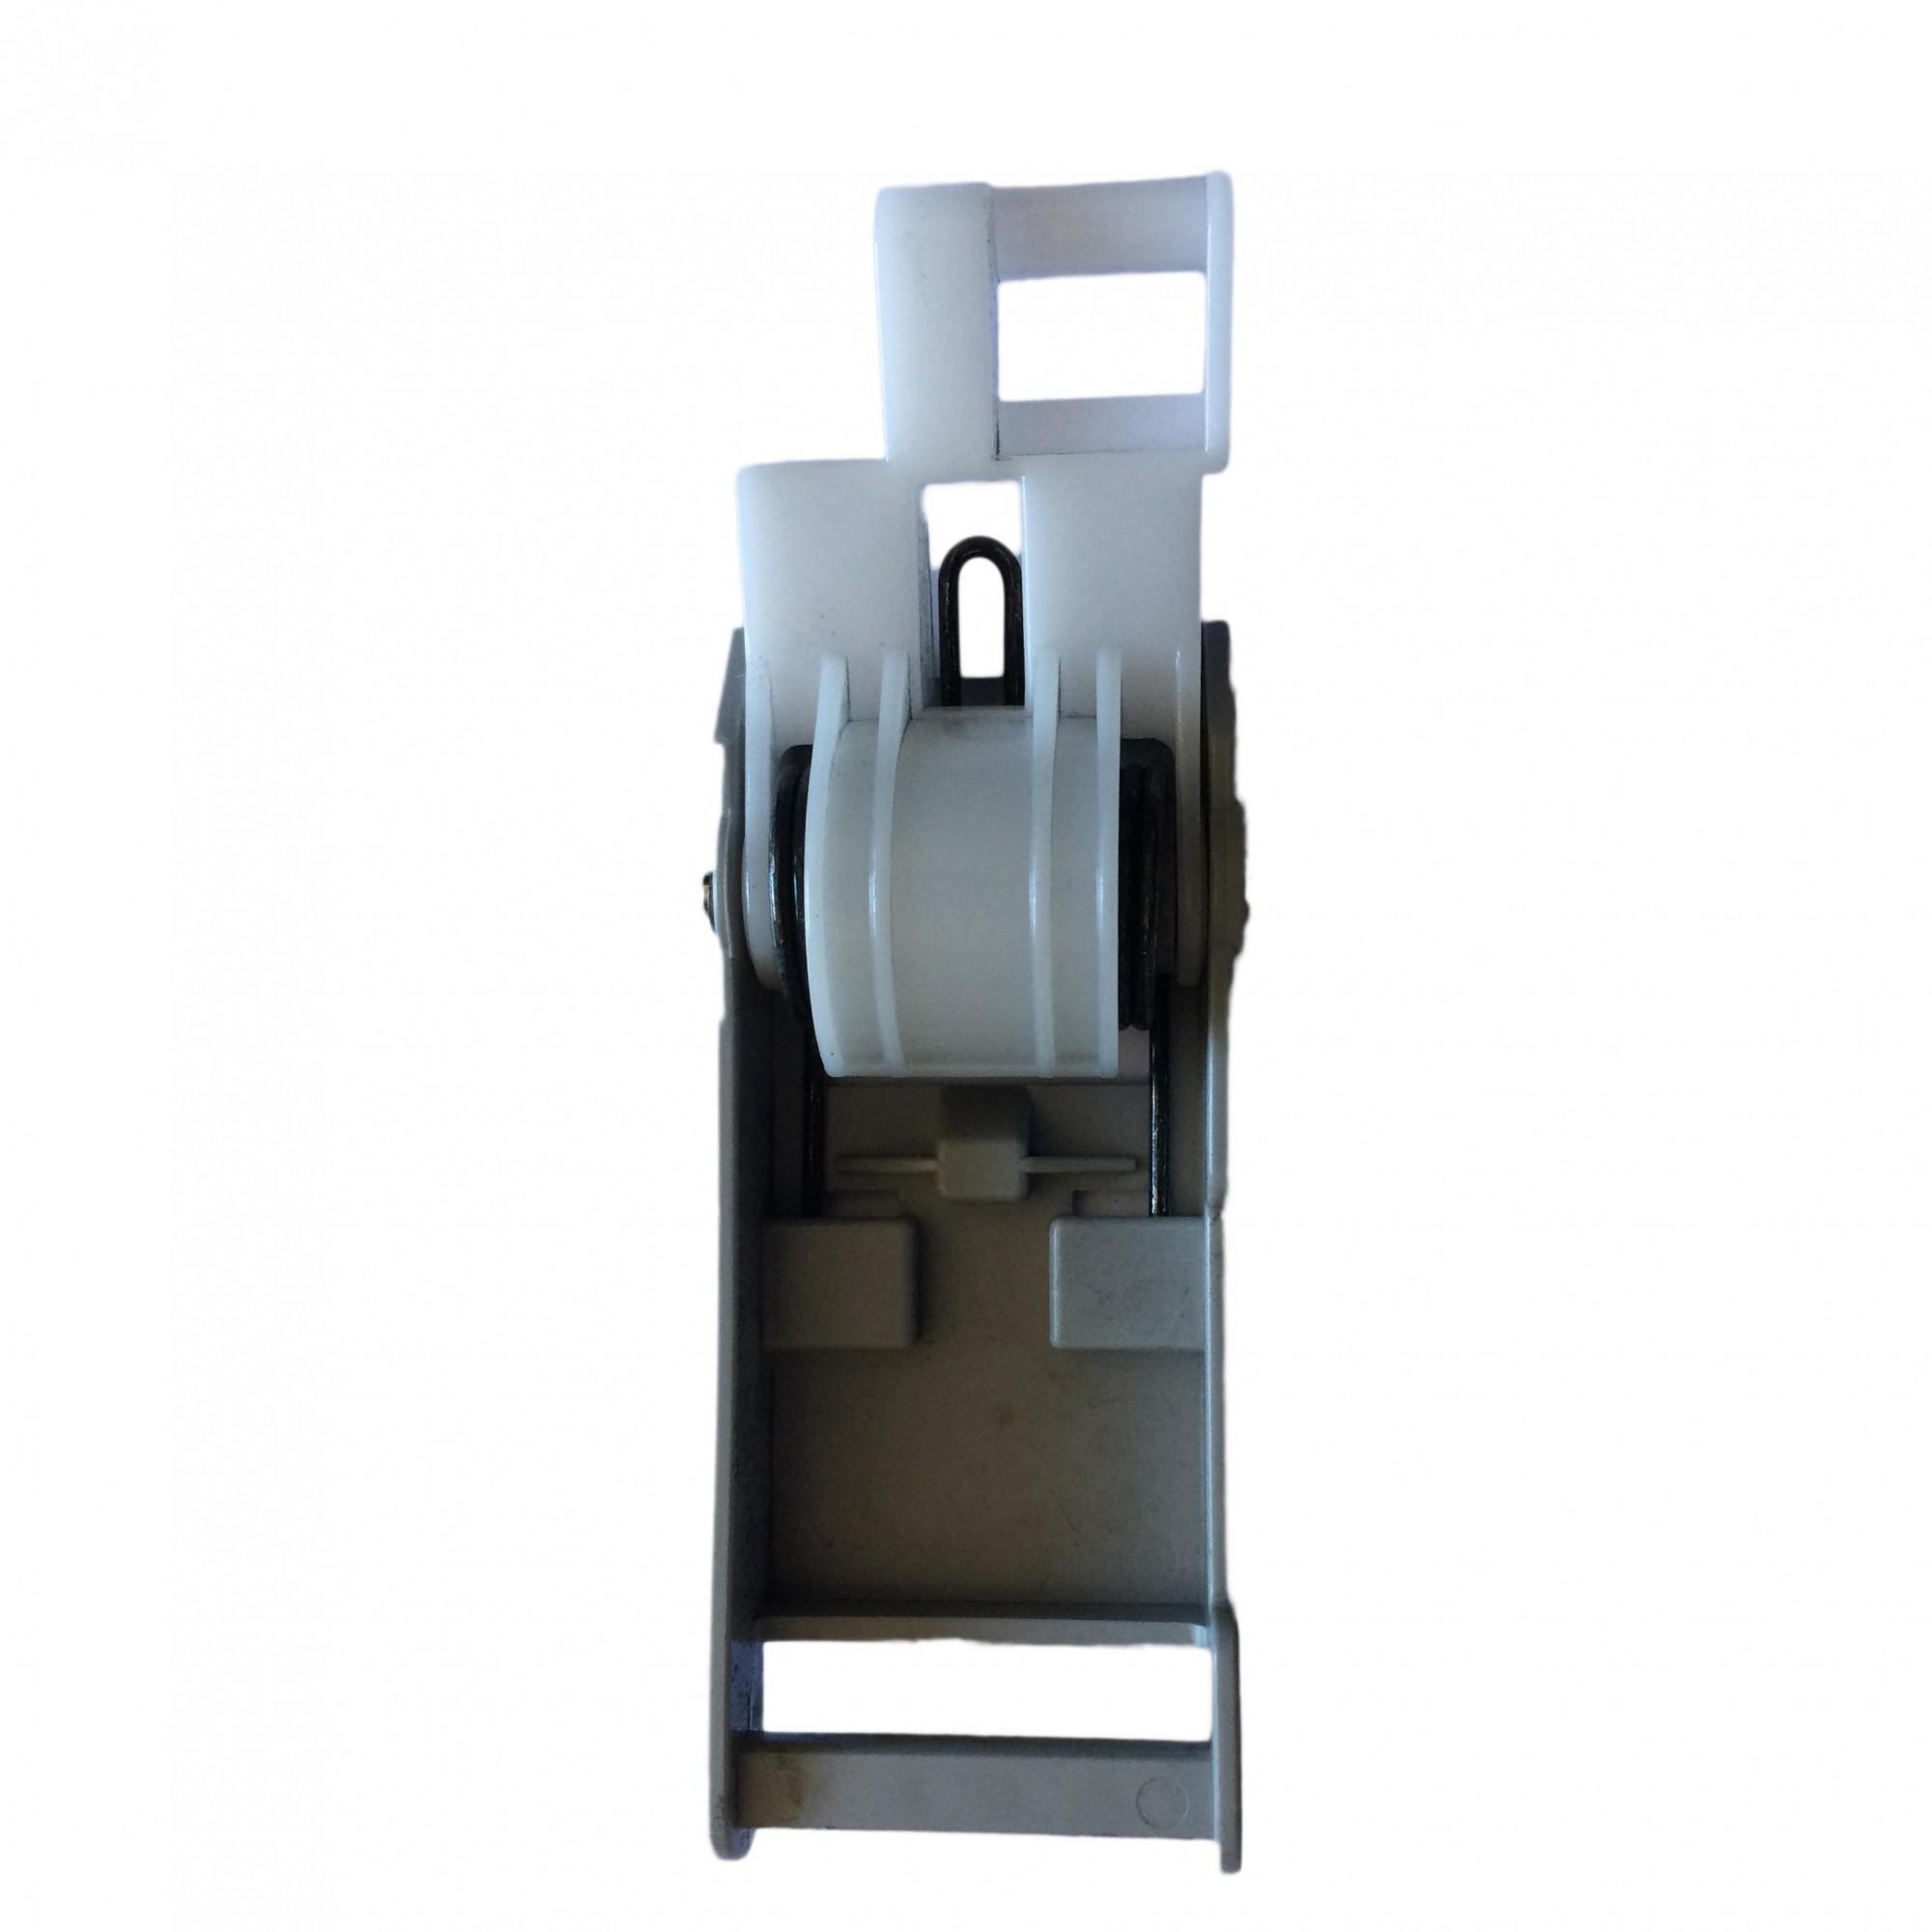 Dobradiça Mesa Do Scanner Multifuncional Samsung Sl-c410w C460w C460fw C480fw PN:Jc61-04441a - Retirado